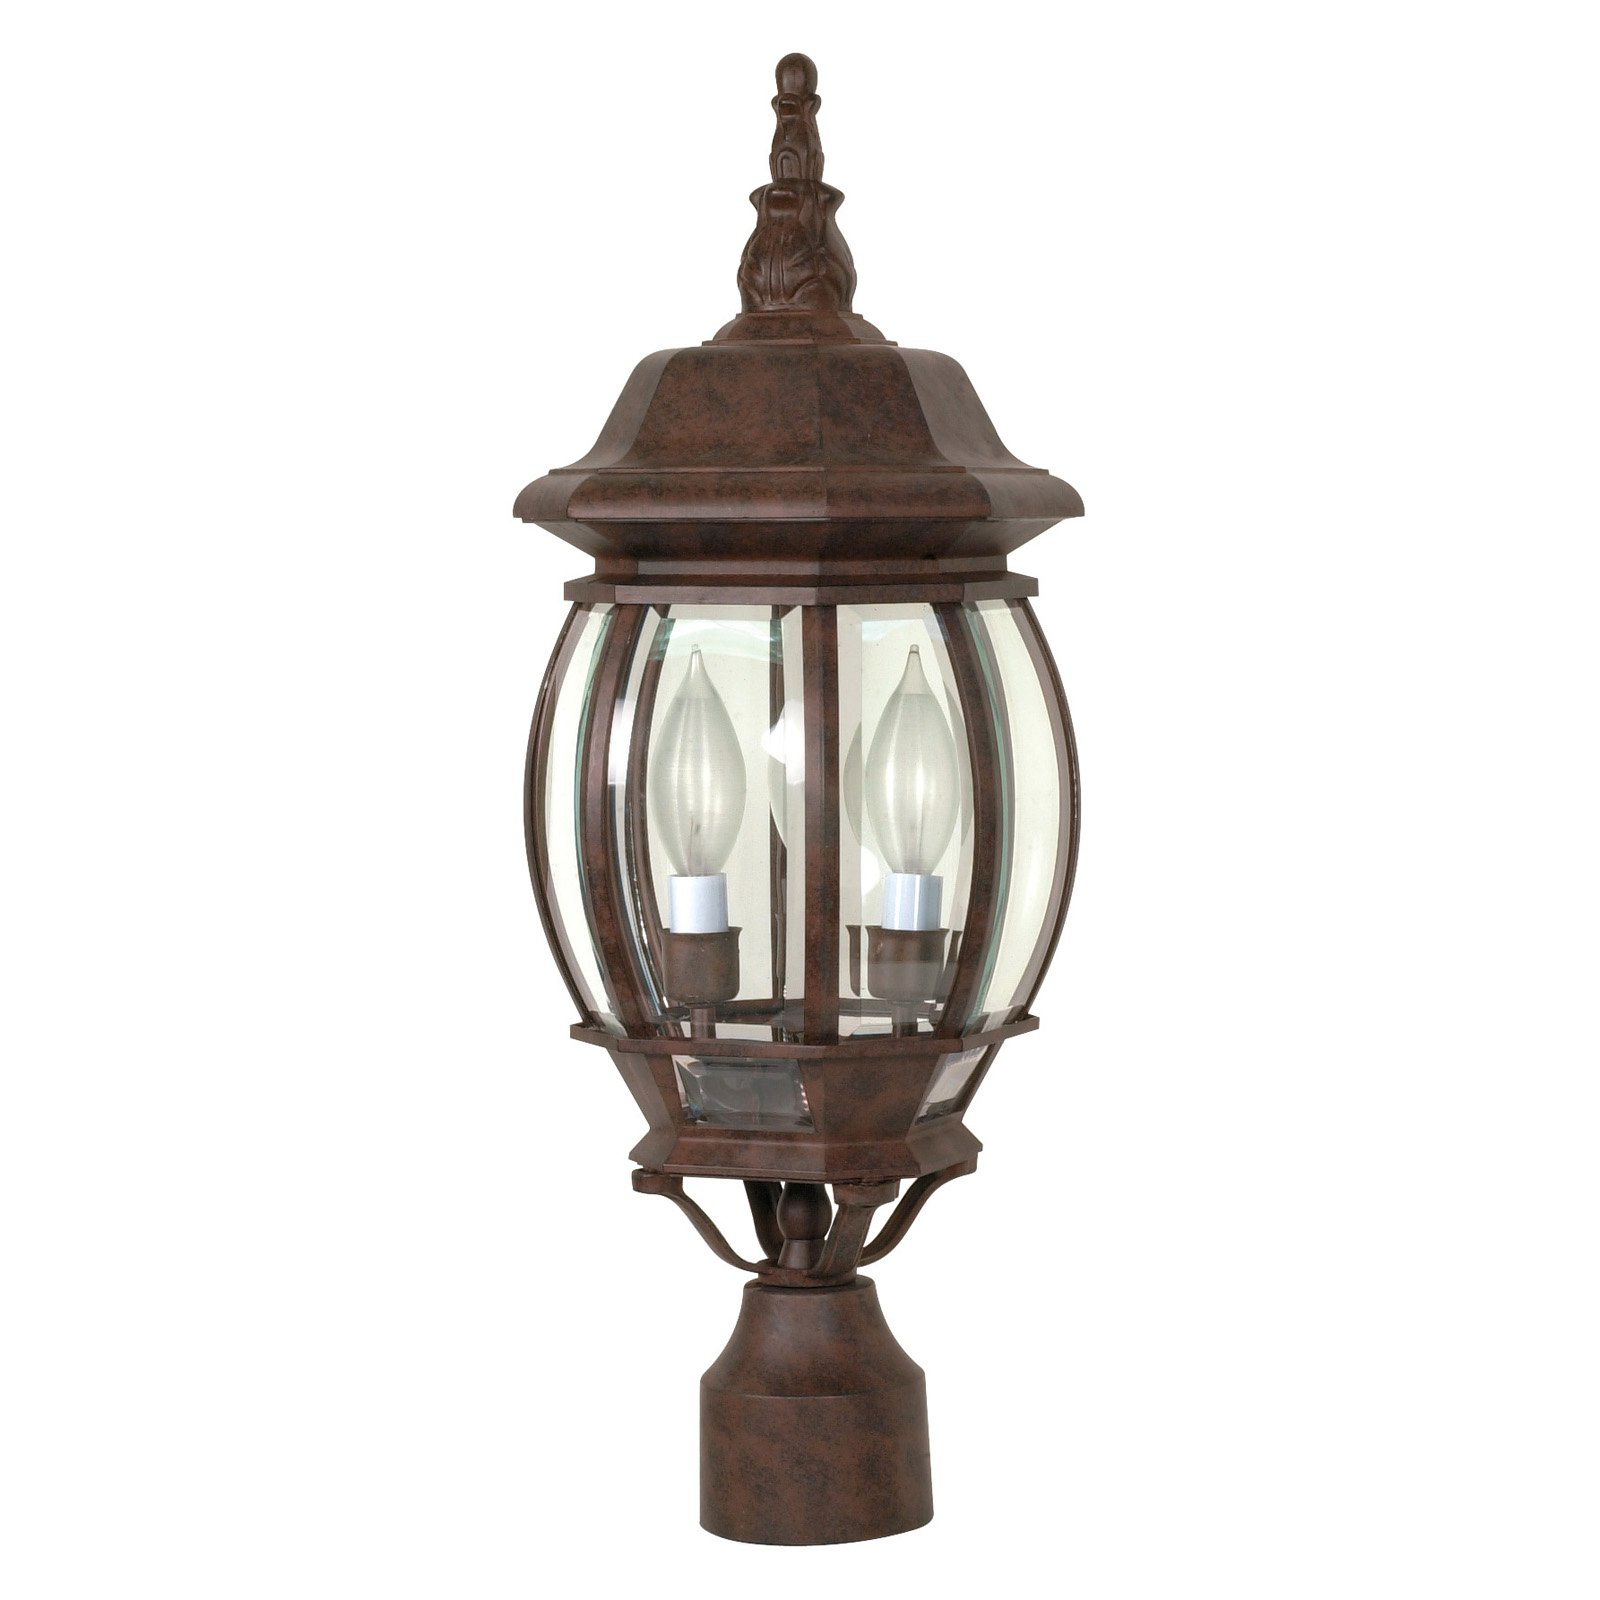 3 Light - 21 in. Post Lantern - Clear Beveled Glass